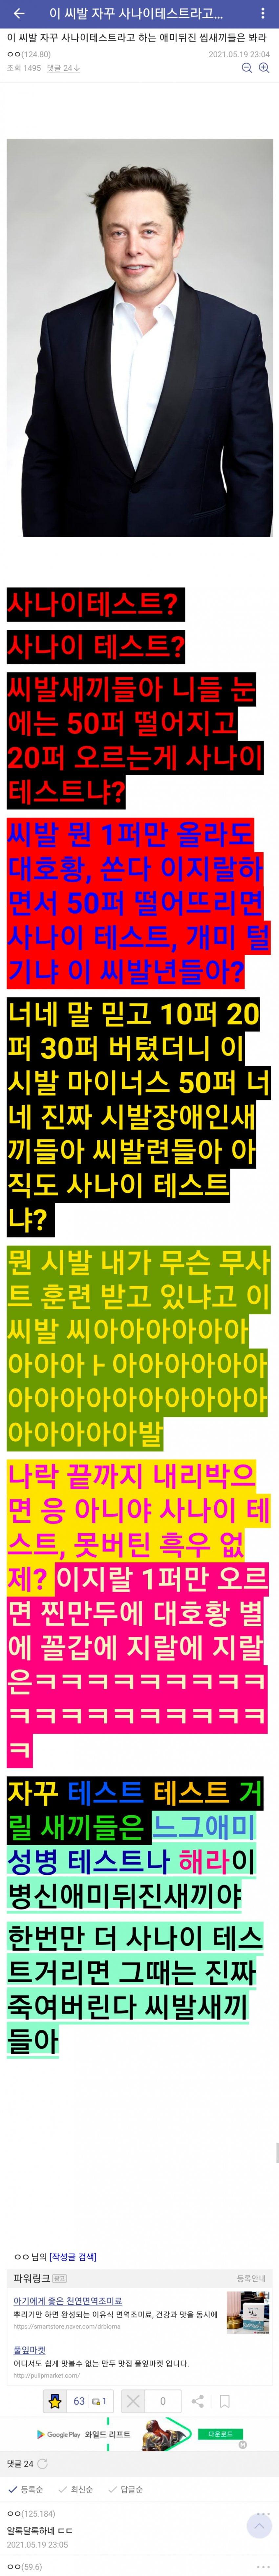 viewimage.php?id=3eb4de21e9d73ab360b8dab04785736f&no=24b0d769e1d32ca73dec8efa11d02831b210072811d995369f4ff09c9cd84d8360b872bbc6f09bb6b9c1363be042e874f62ec01b4dedeeb940411a7038ee7cfb442c6ede554a75fa955c725042072faf762f51f9ad1158f3d004e06e18246dc0a8bb8ef3d7ce